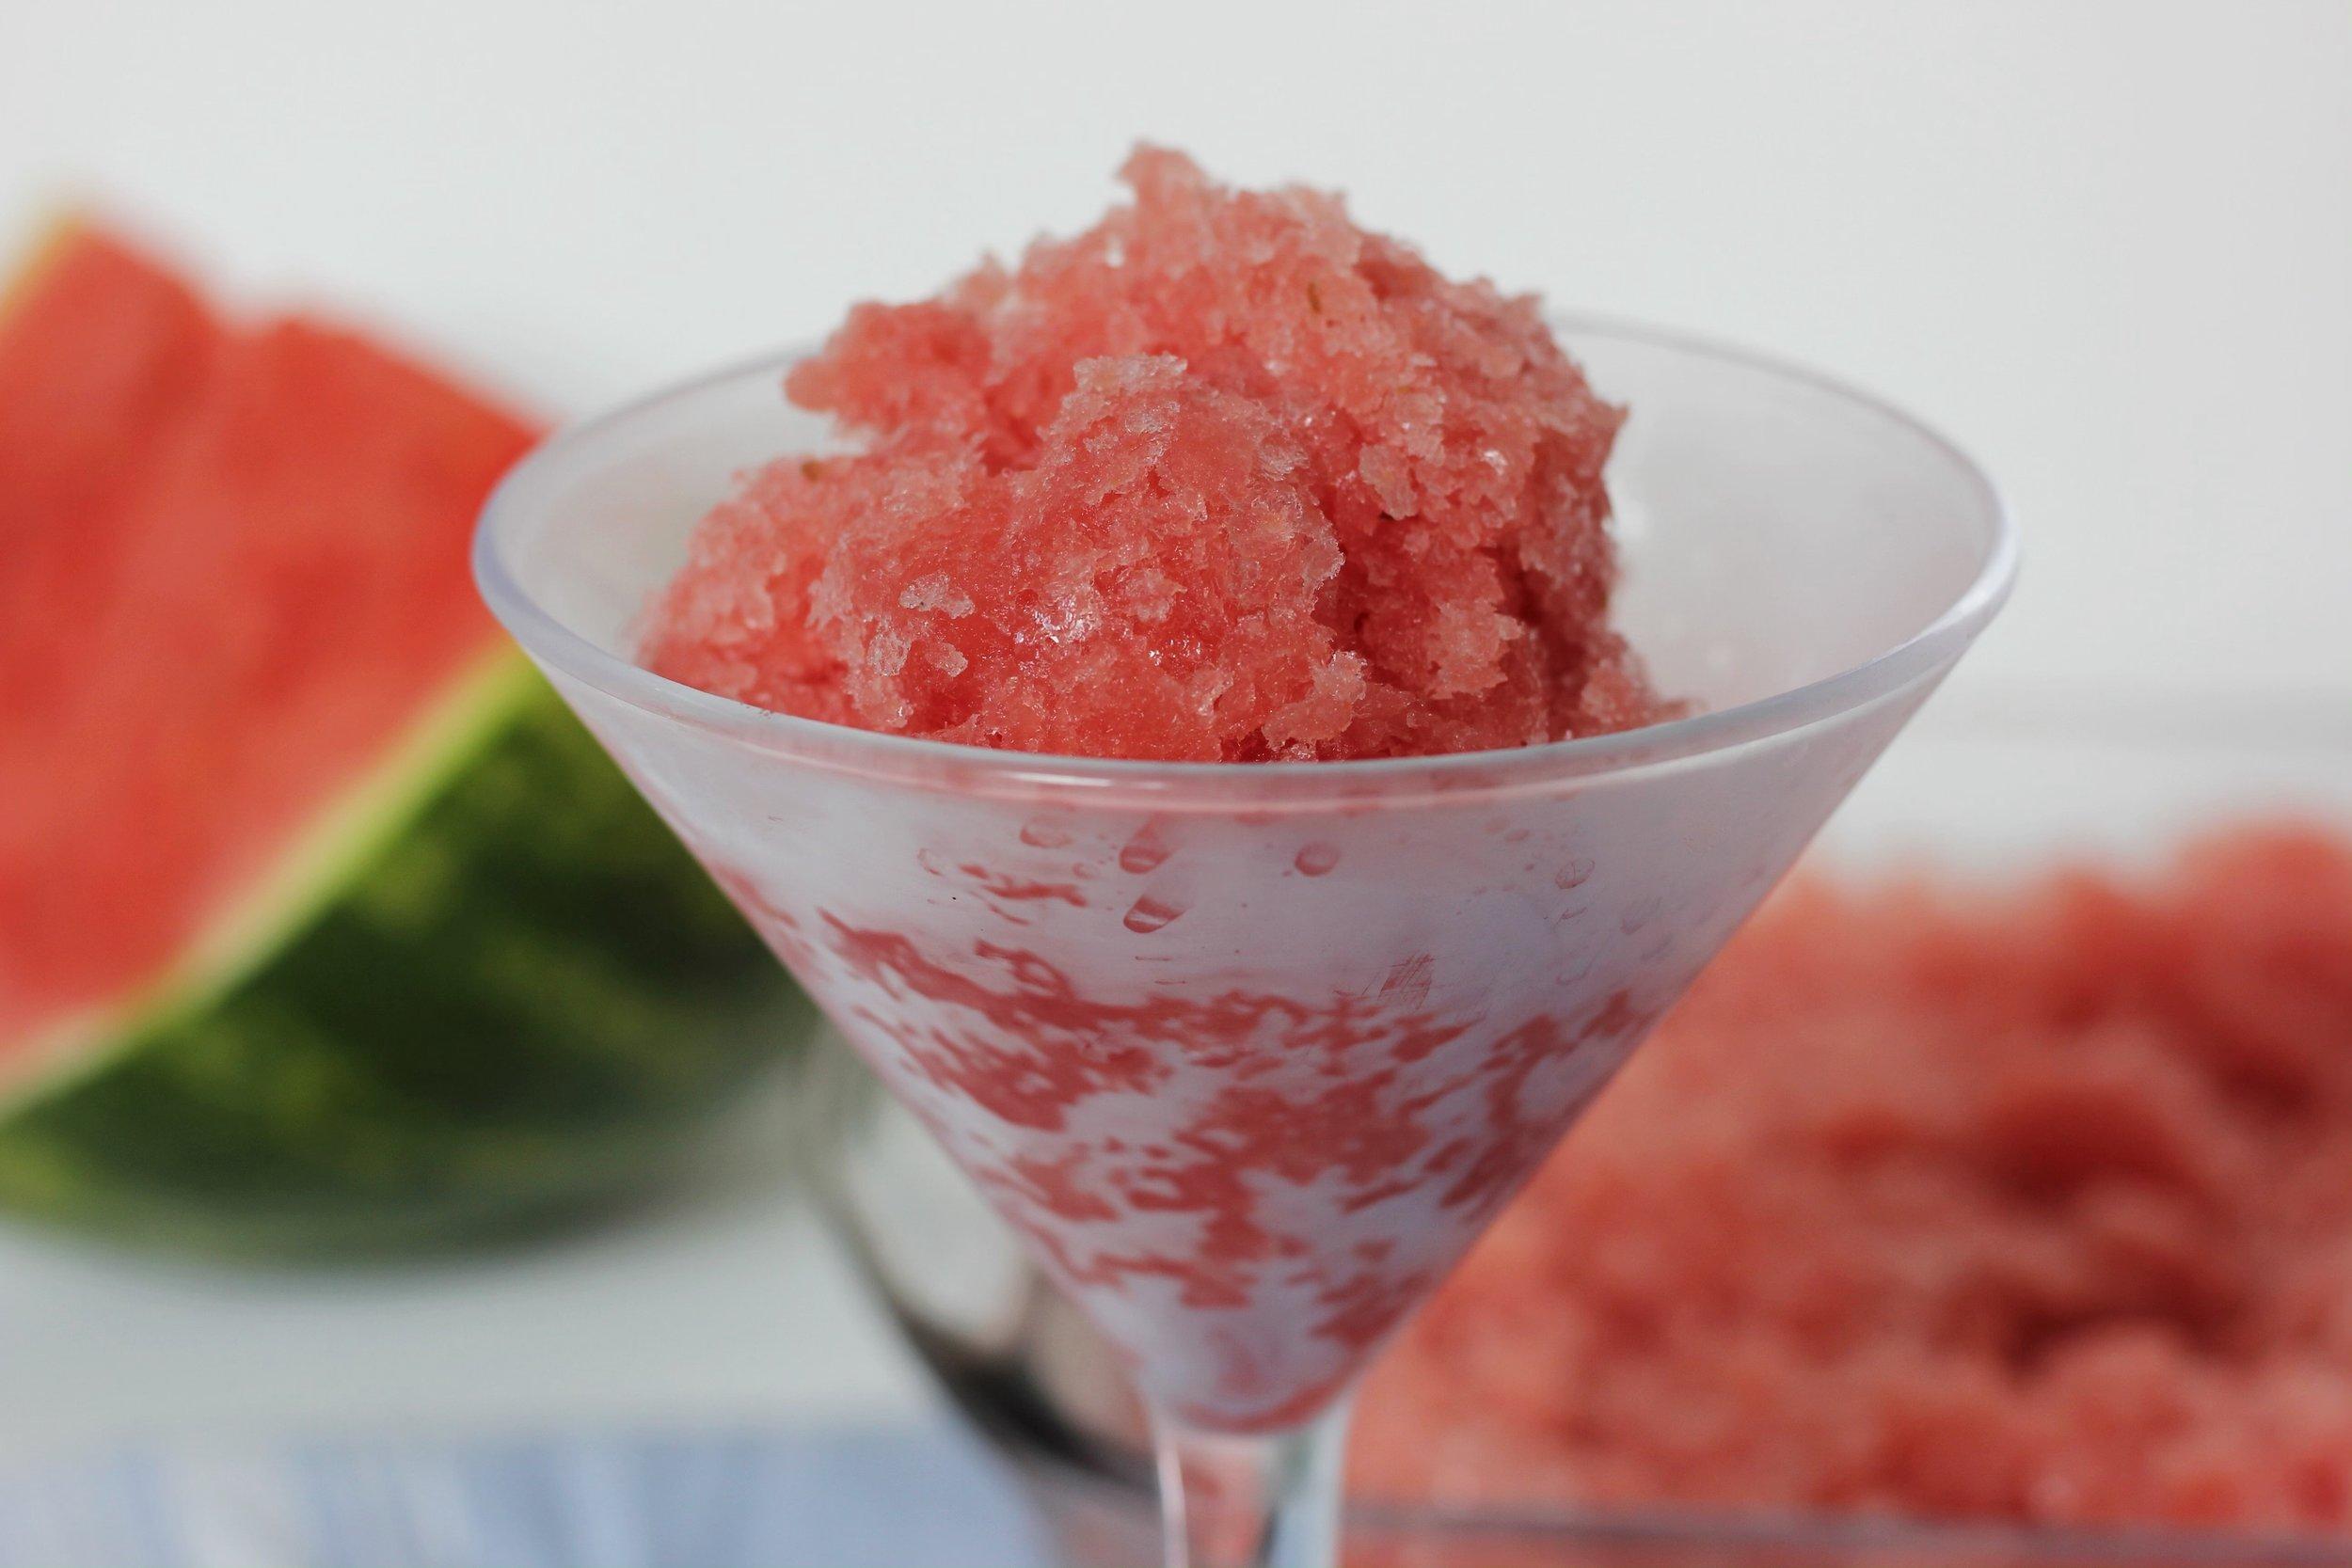 Easy No Bake Summertime Dessert by Kerry Fannon, Registered Dietitian Nutritionist in Fort Lauderdale